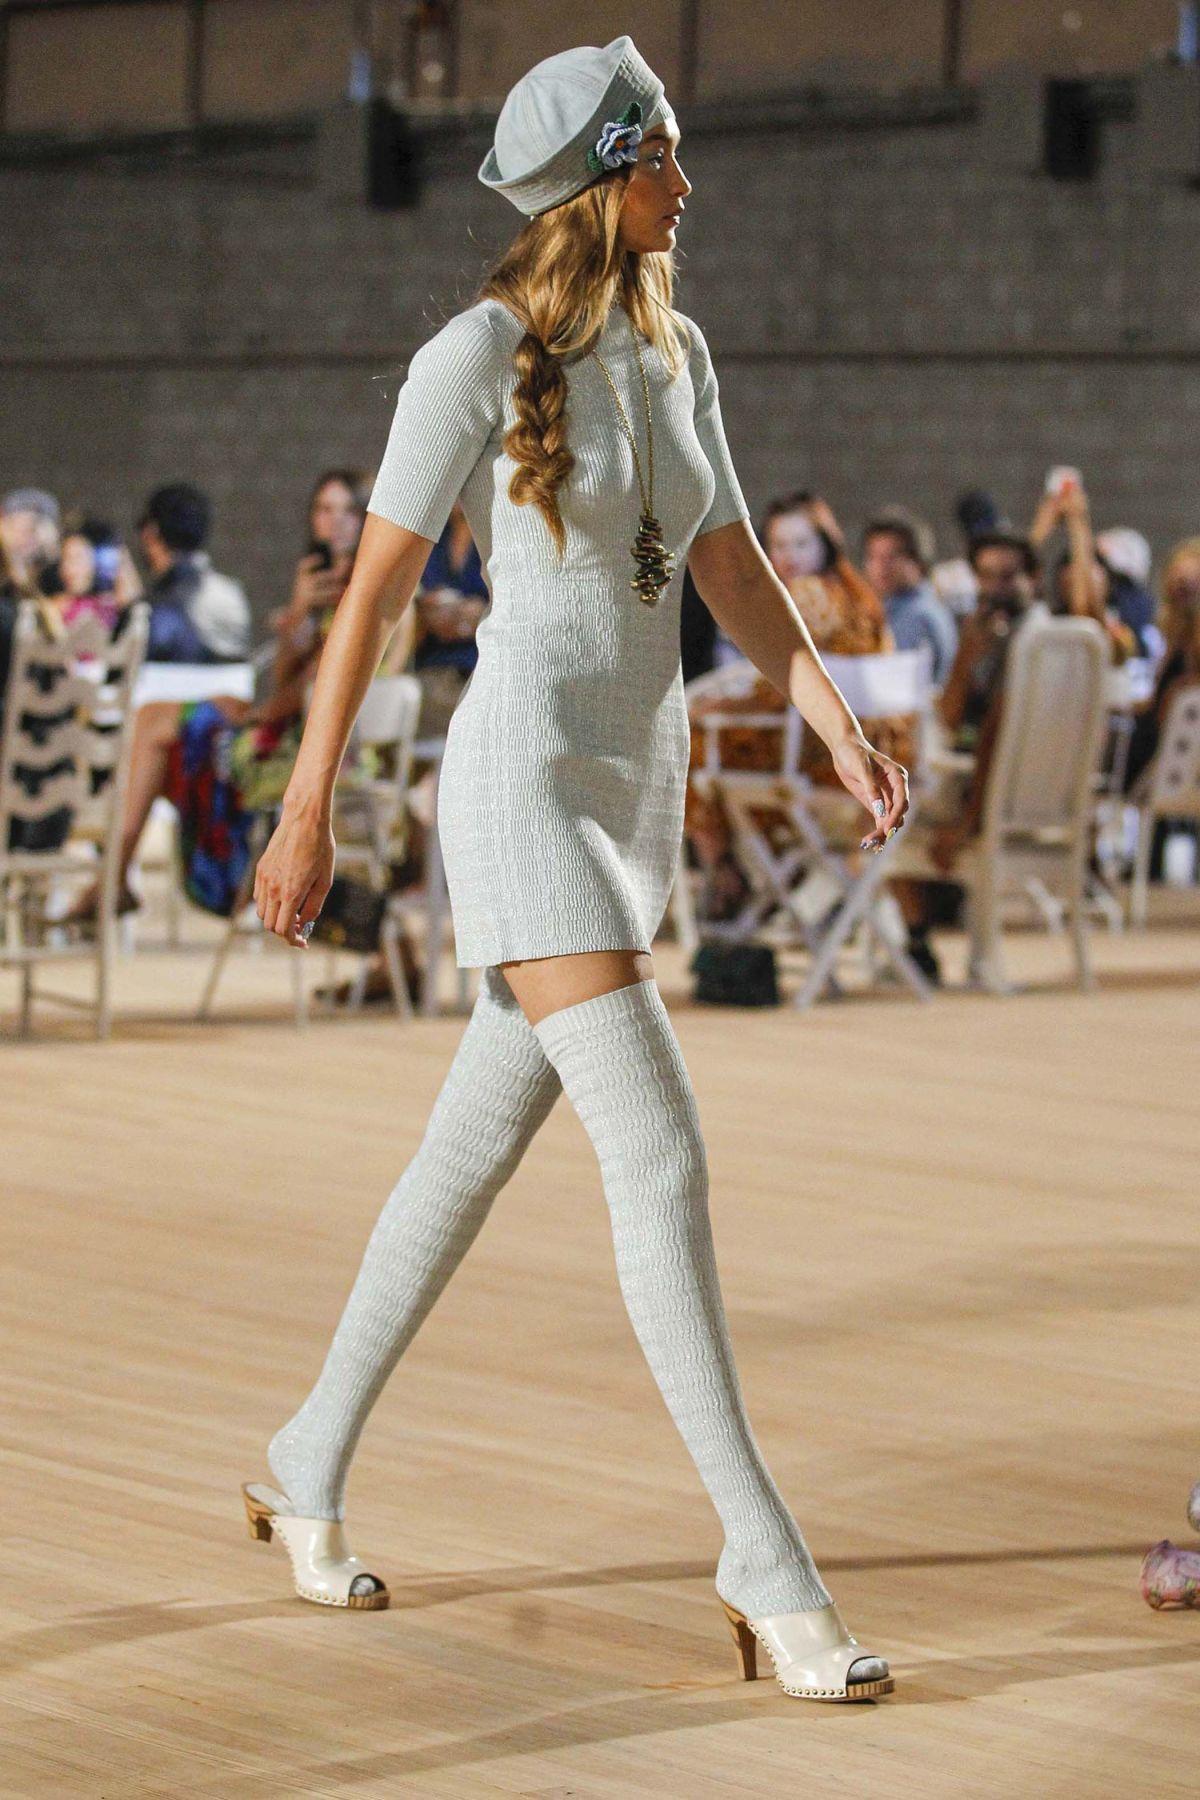 Marc Jacobs Runway at New York Fashion Week